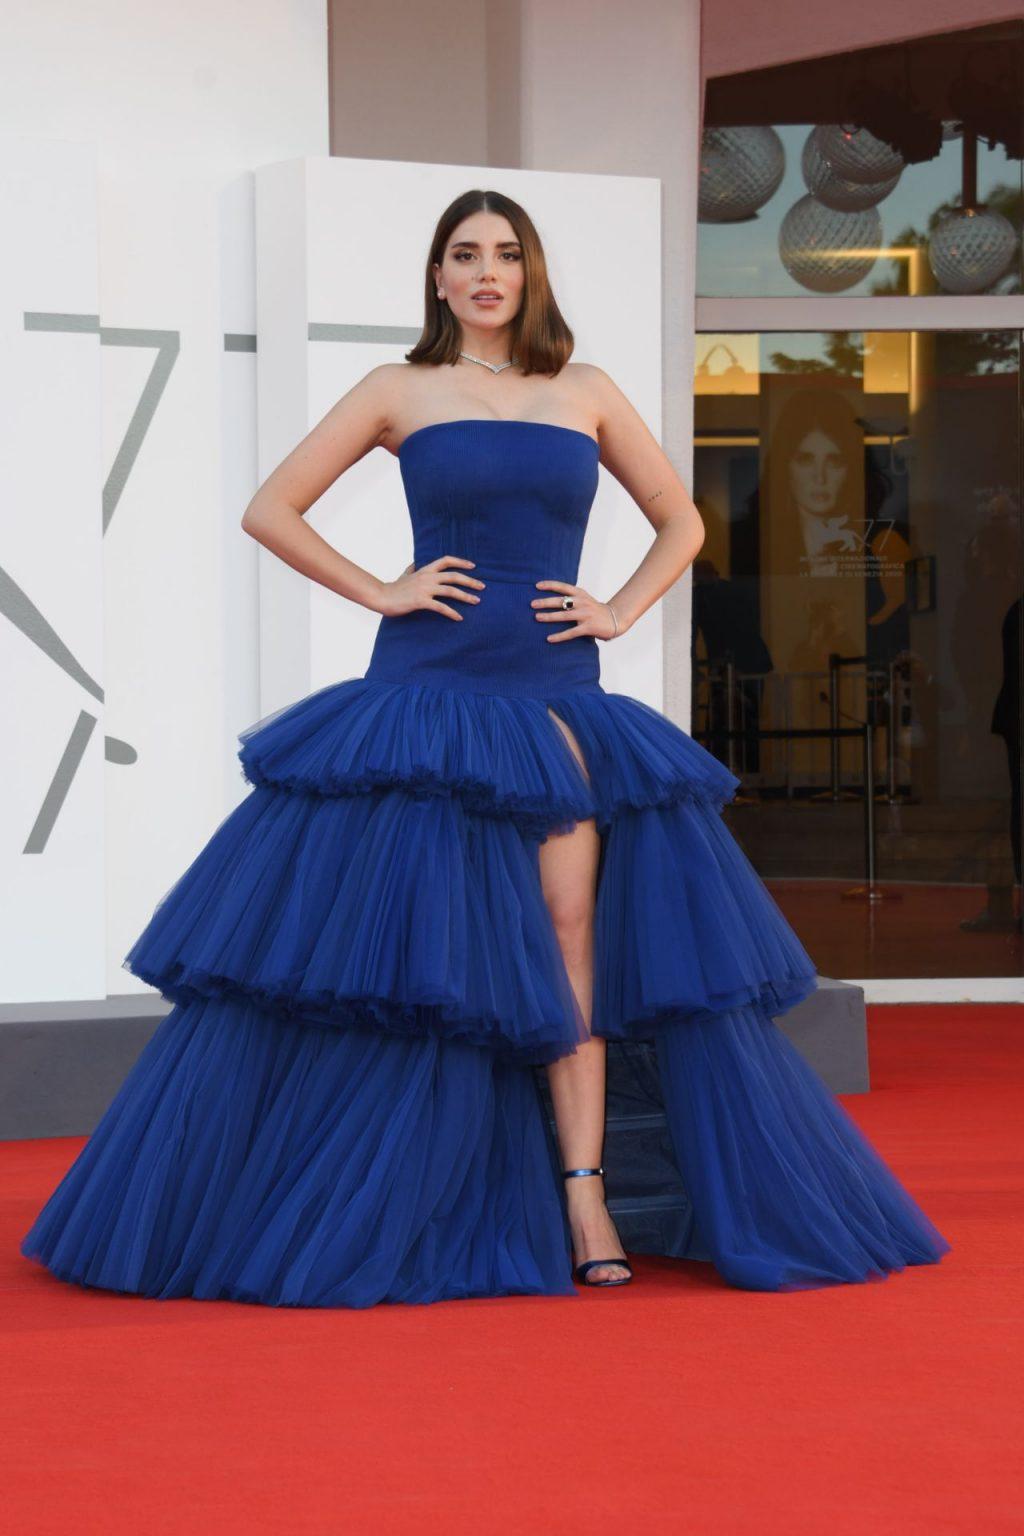 Cynthia Samuel Stuns in a Blue Dress at the 77th Venice Film Festival (20 Photos)